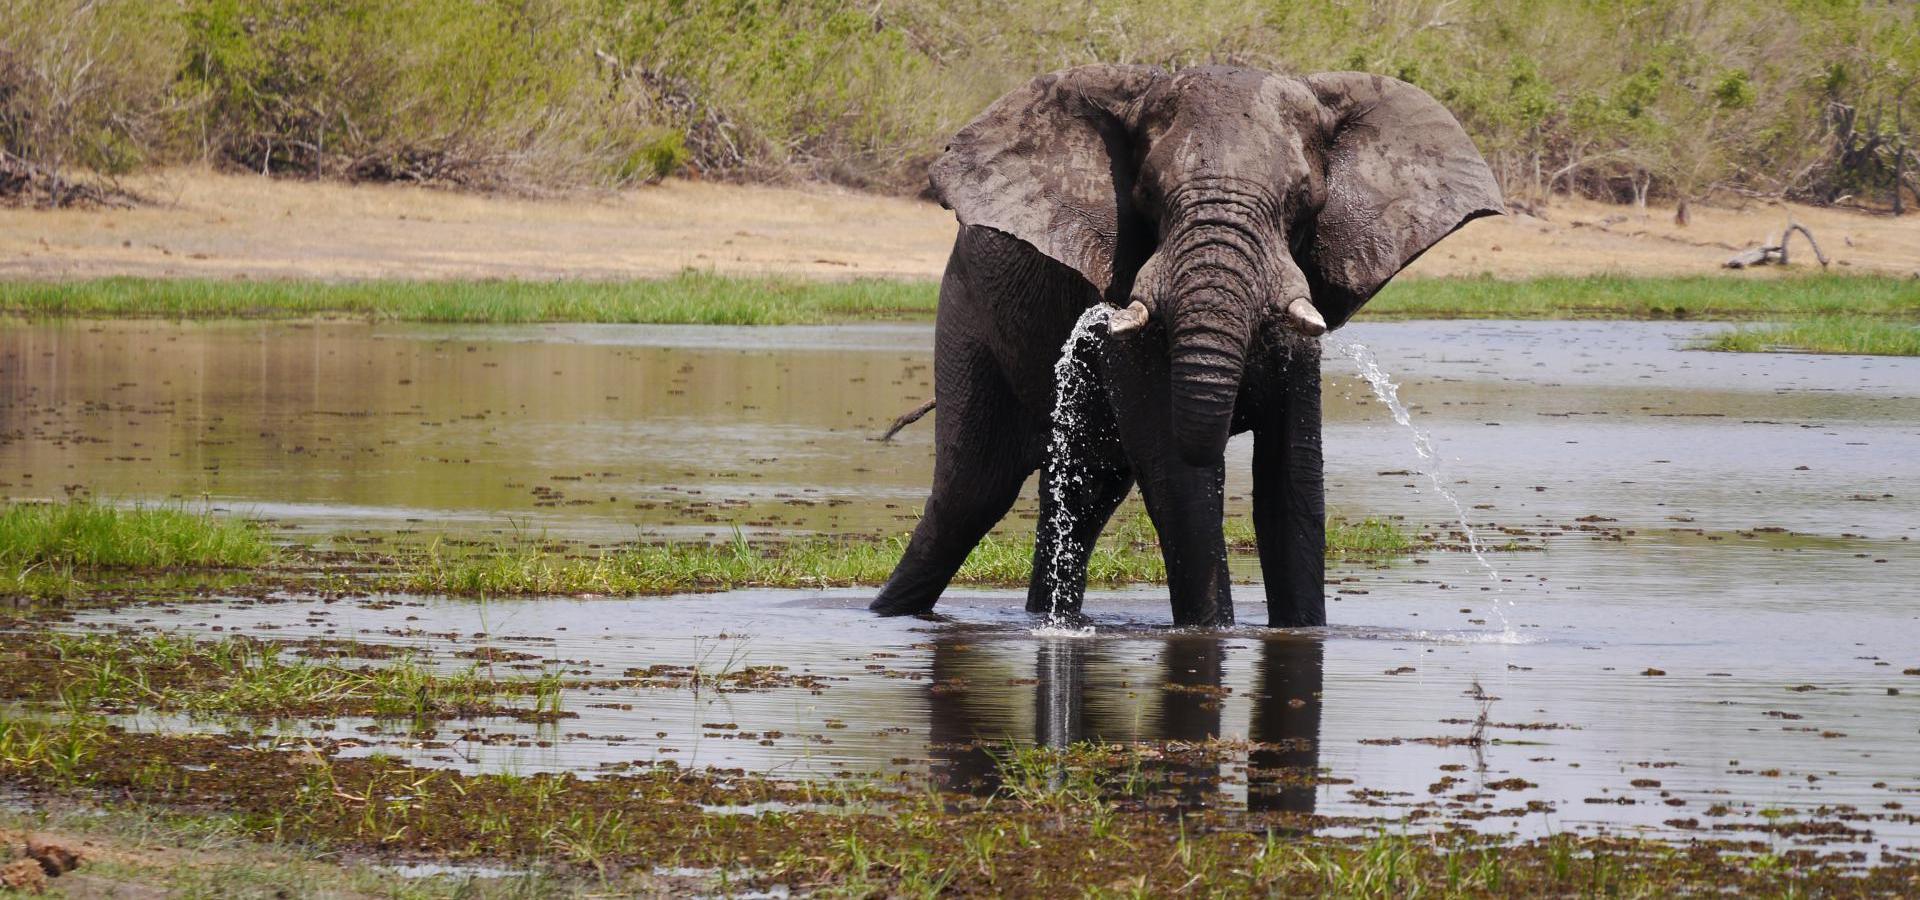 Elefant - Botswana Reisen & Urlaub